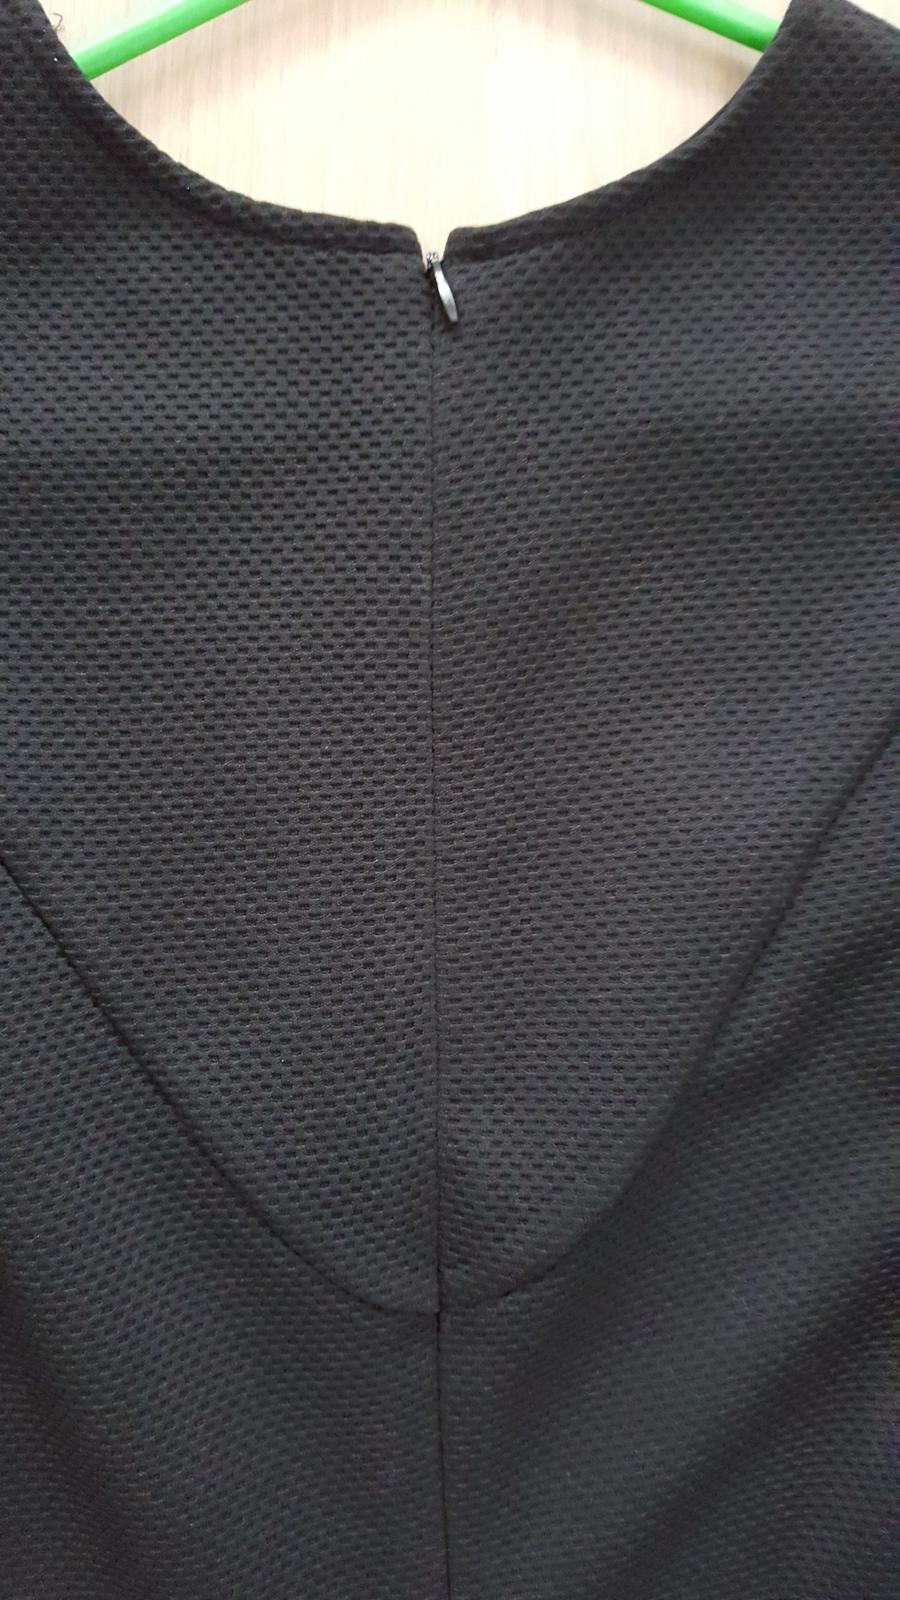 šaty chantall - Obrázok č. 3